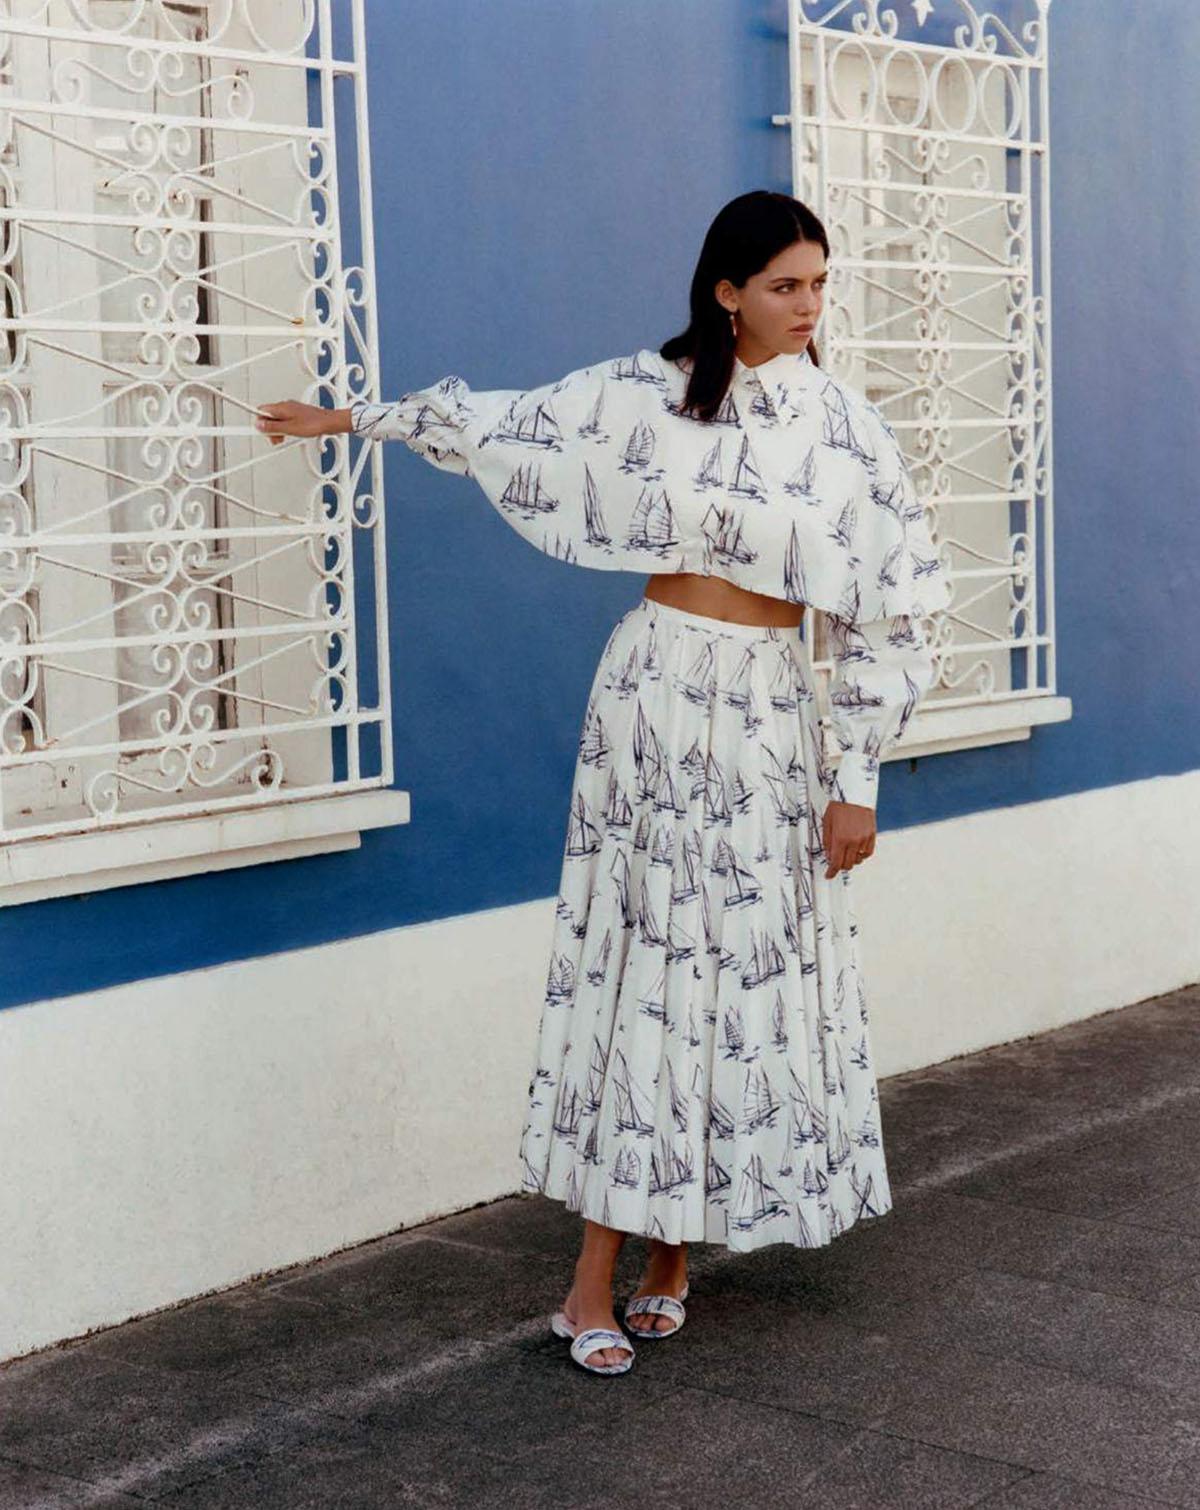 Maria Miguel by Santi de Hita for Vogue Spain July 2021